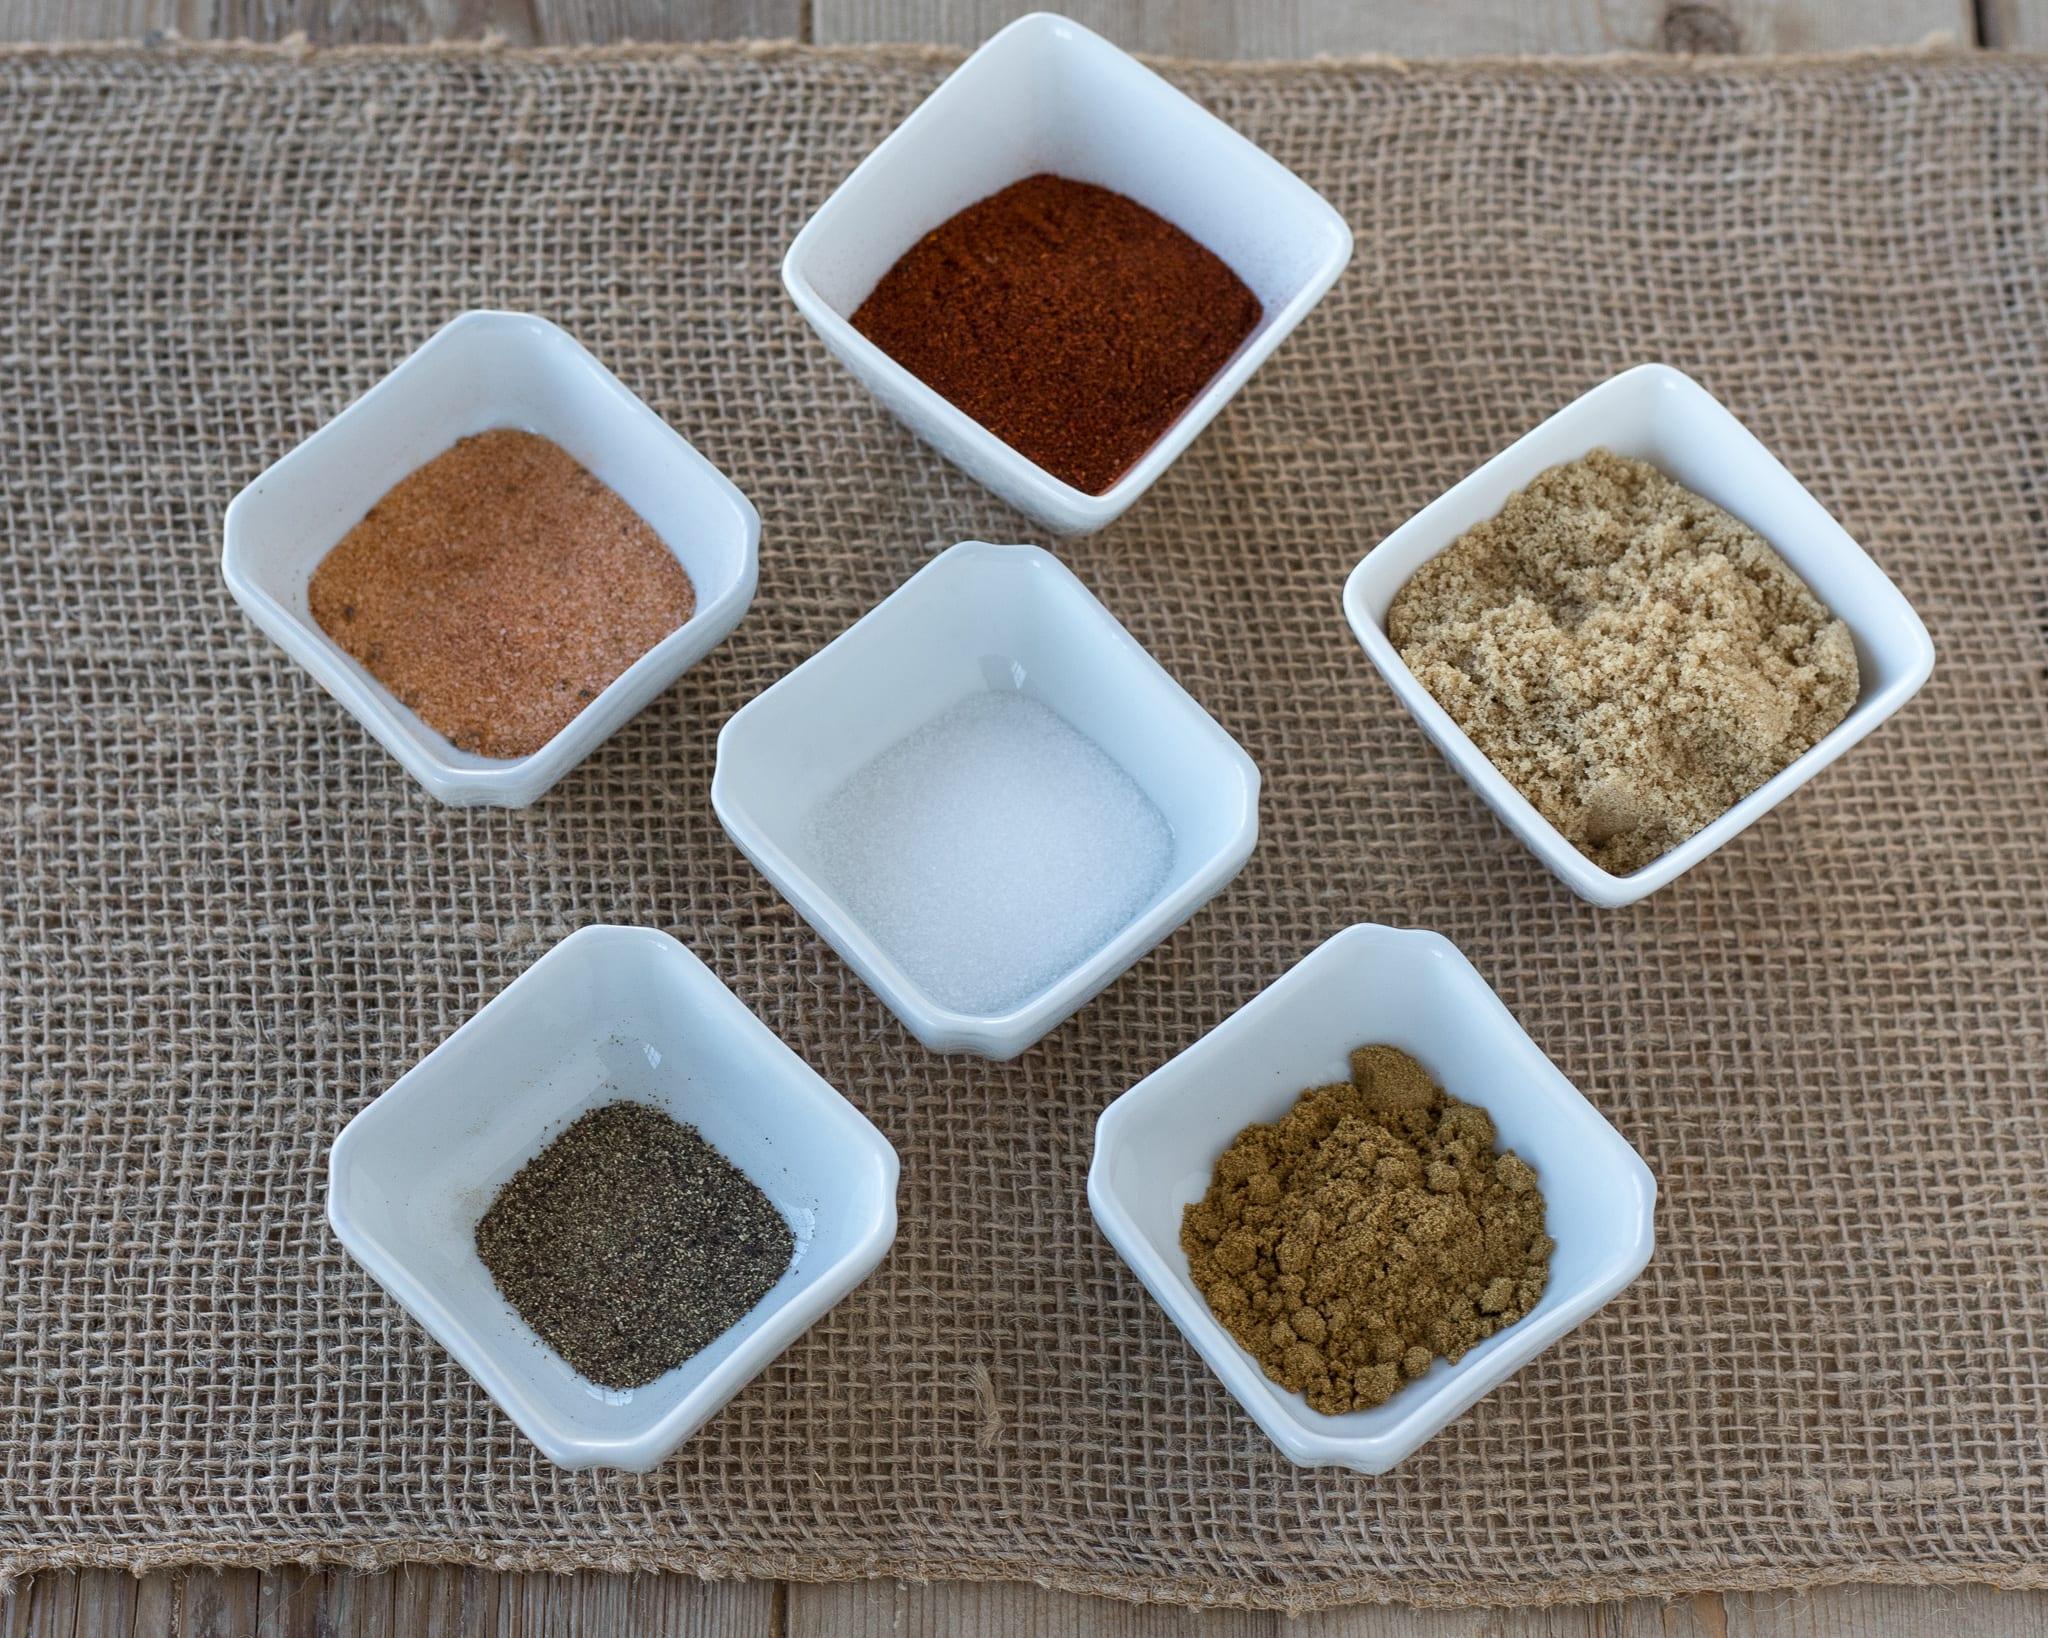 seasonings for chili recipe